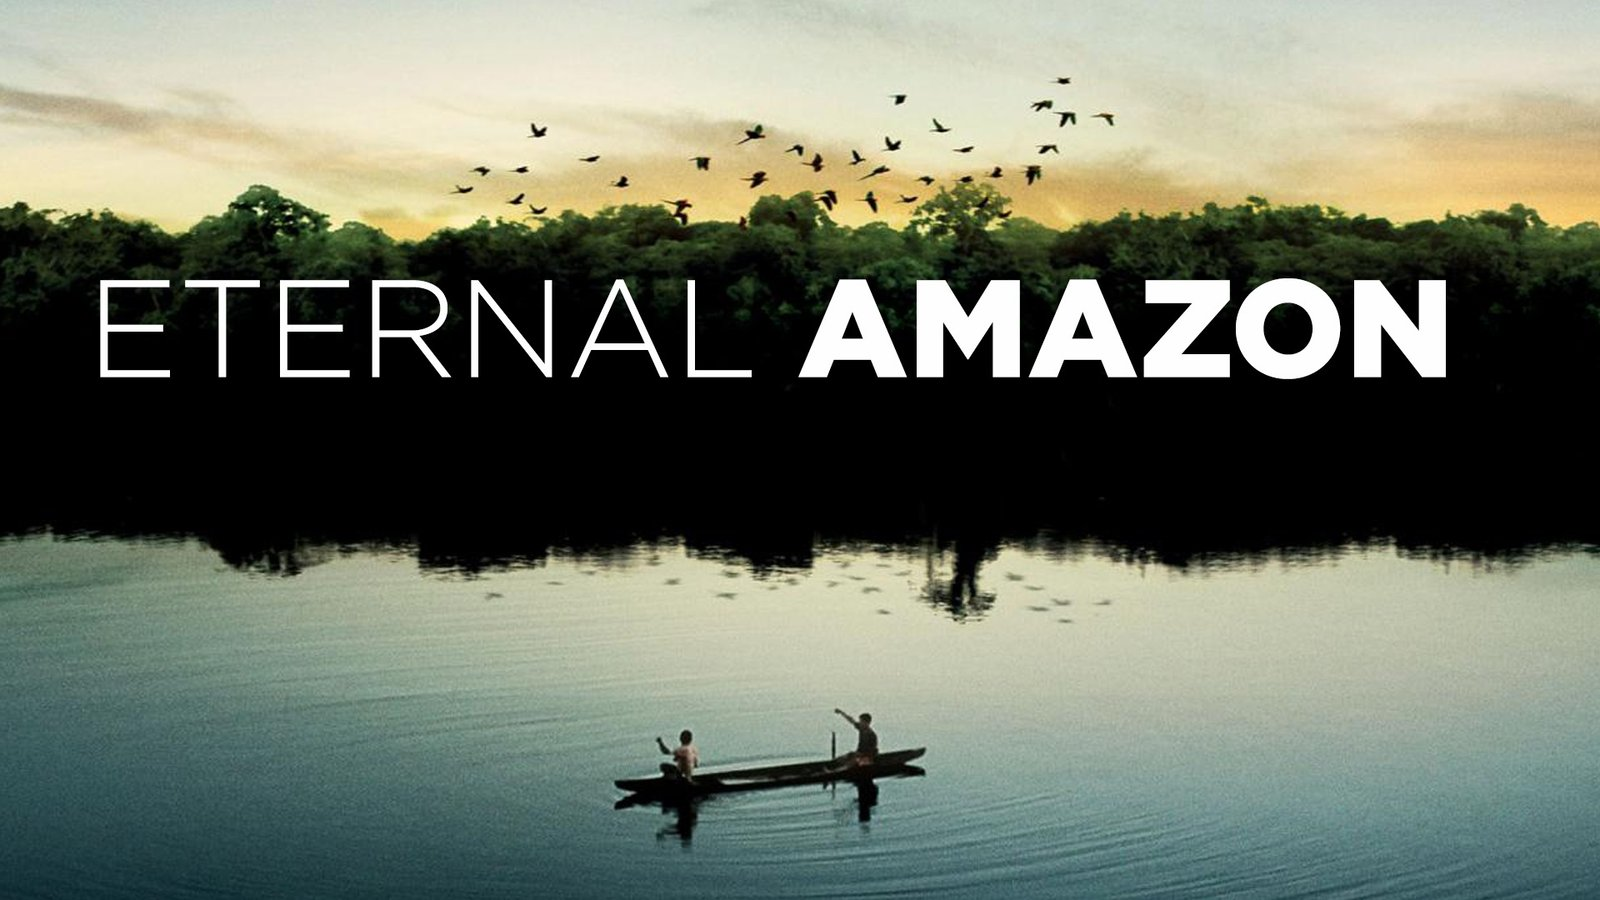 Eternal Amazon (Amazonia Eterna) - Exploring the Amazon Rainforest